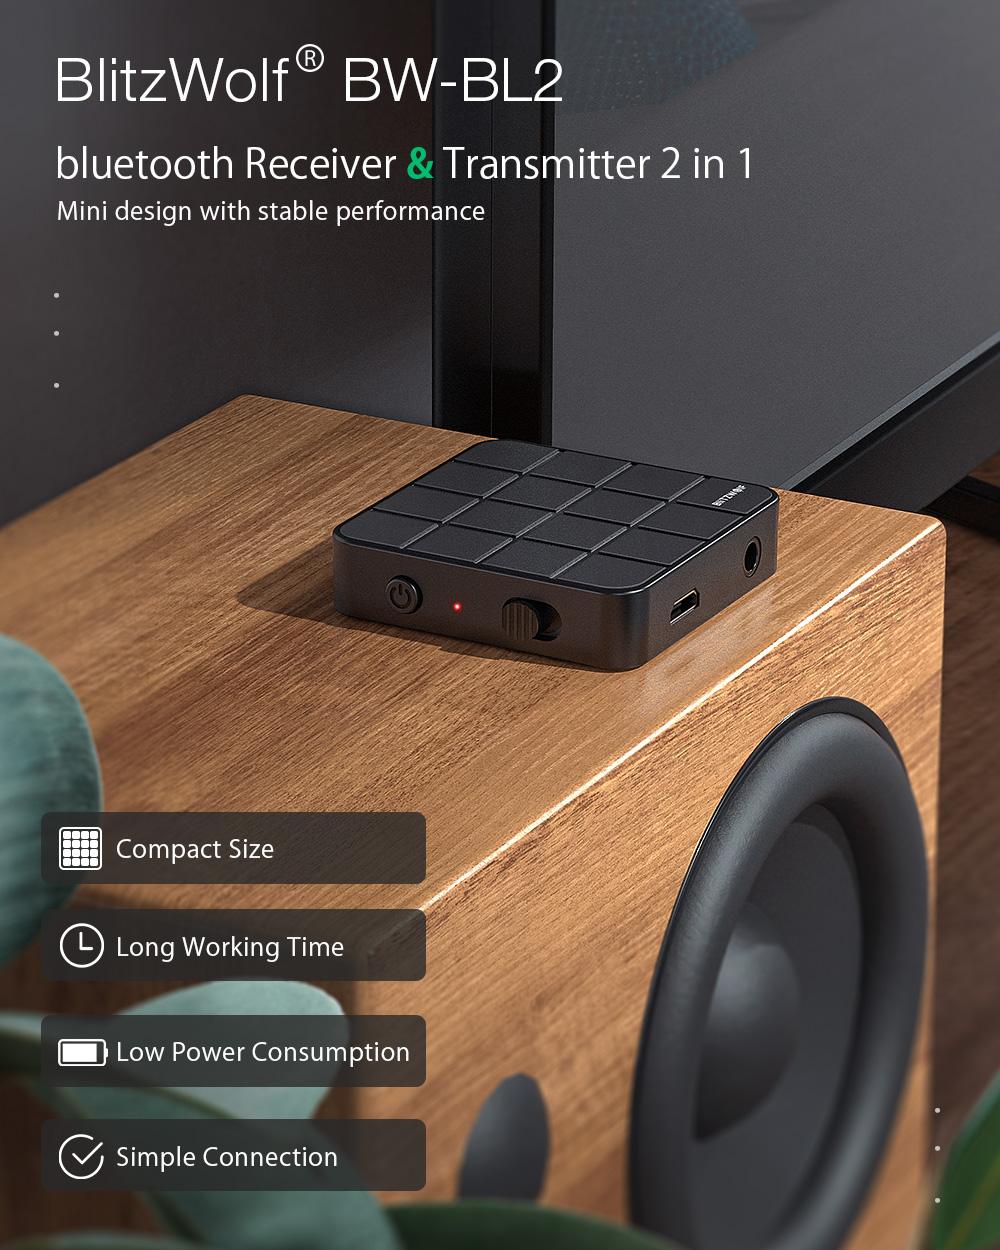 Blitzwolf BW-BL2 bluetooth receiver and transmitter